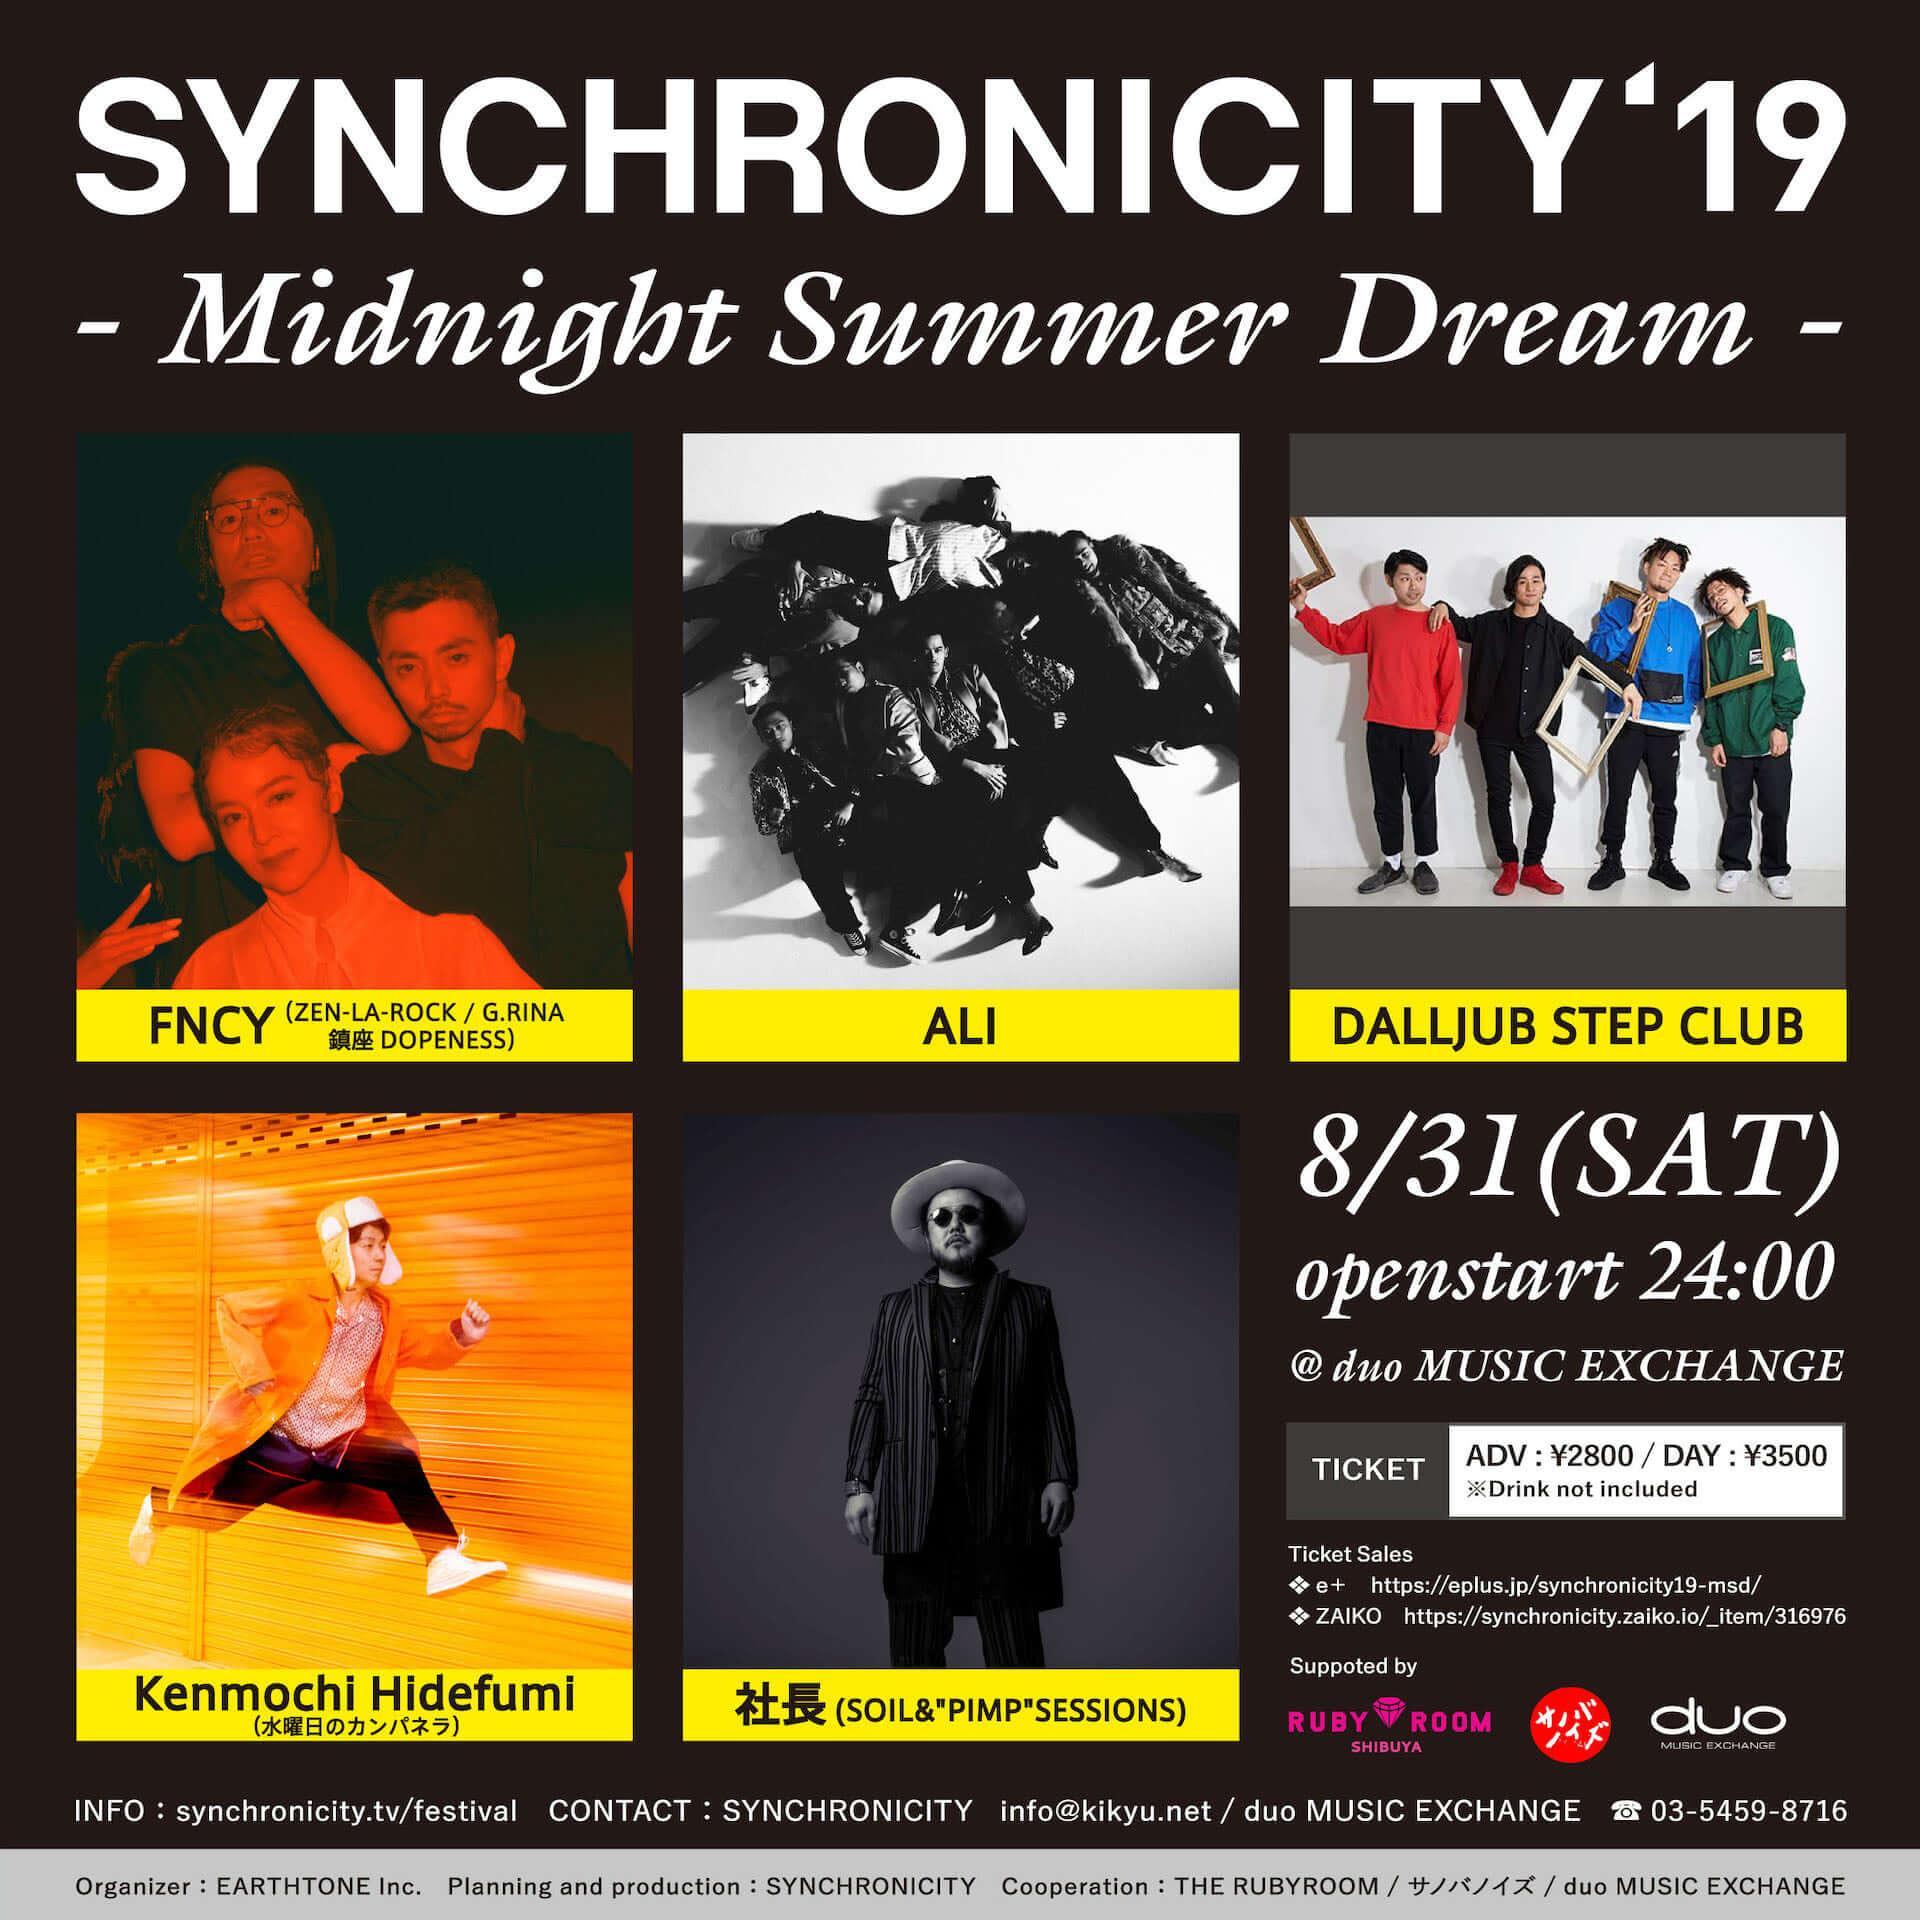 FNCY、Kenmochi Hidefumiなどが出演|<SYNCHRONICITY>企画のオールナイトパーティーが開催 music190725synchronicity_1-1920x1920